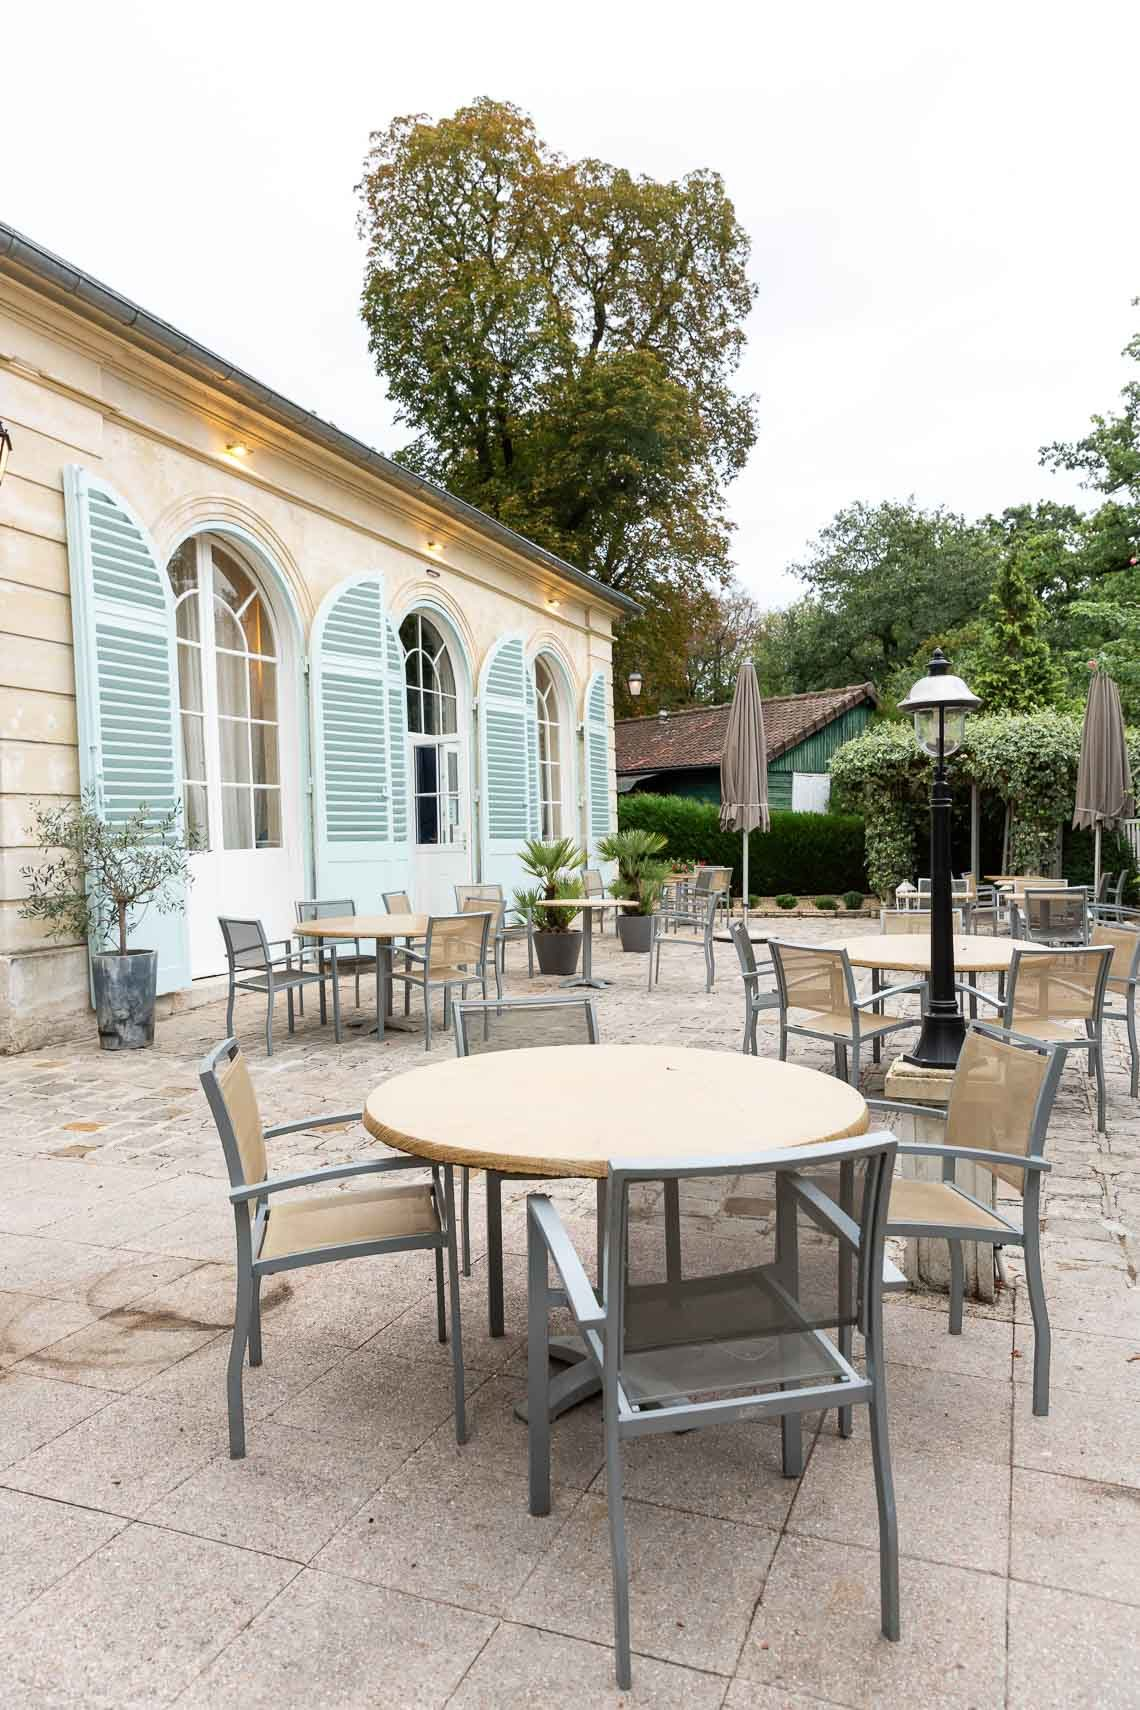 Anniversaire restaurant saint-germain-en-laye